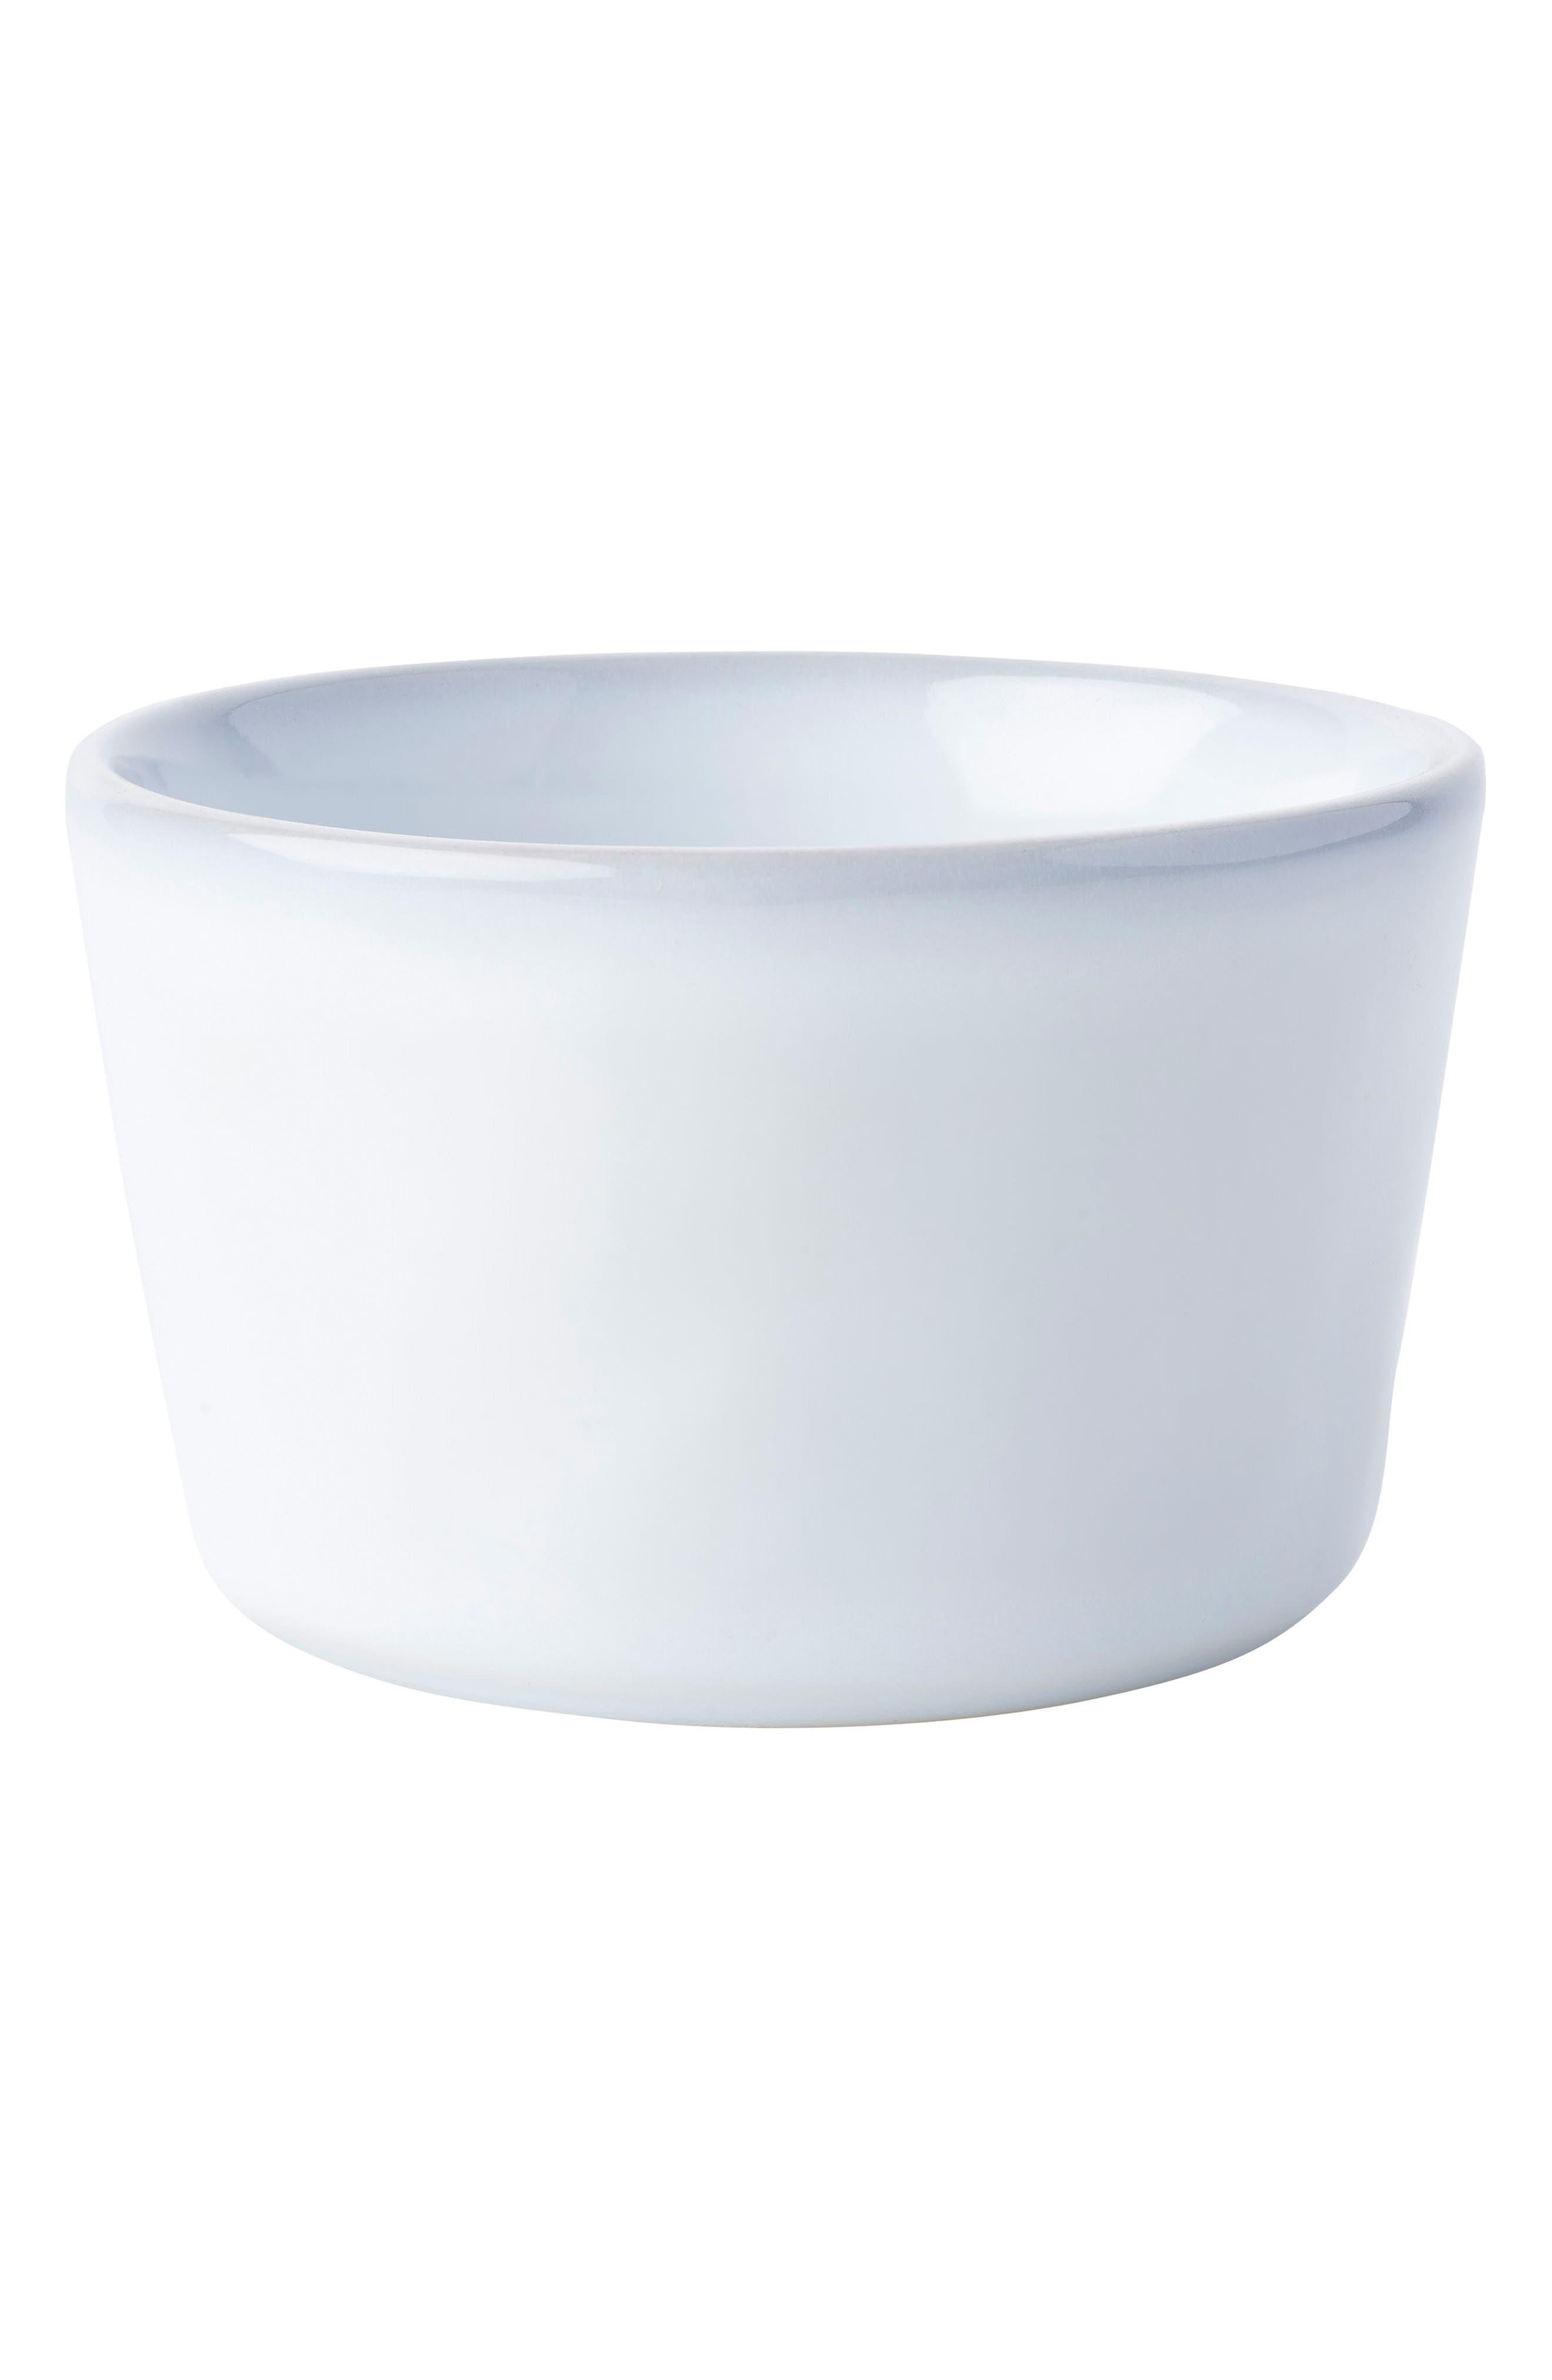 Quotidien White Truffle Ceramic Ramekin,                             Main thumbnail 1, color,                             White Truffle